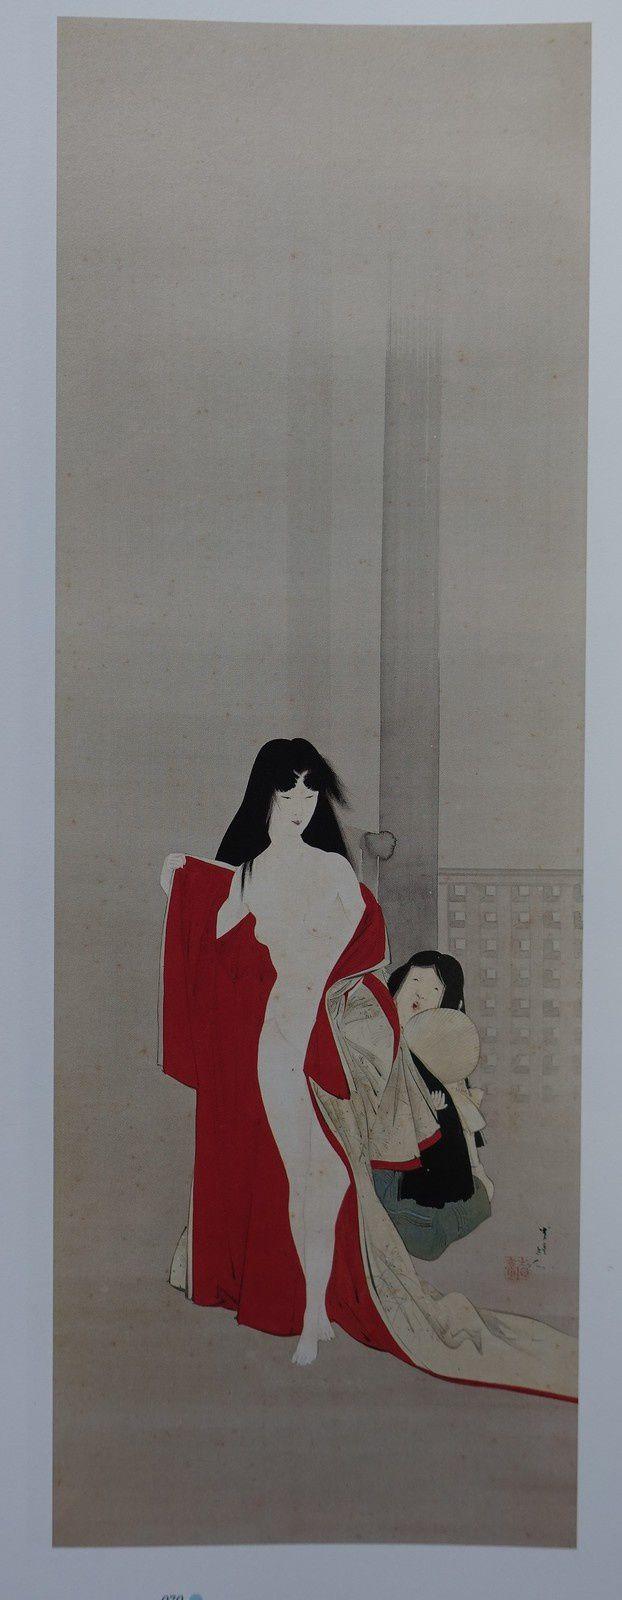 Exposition d'oeuvres de la collection Baikôan: Bijin-ga